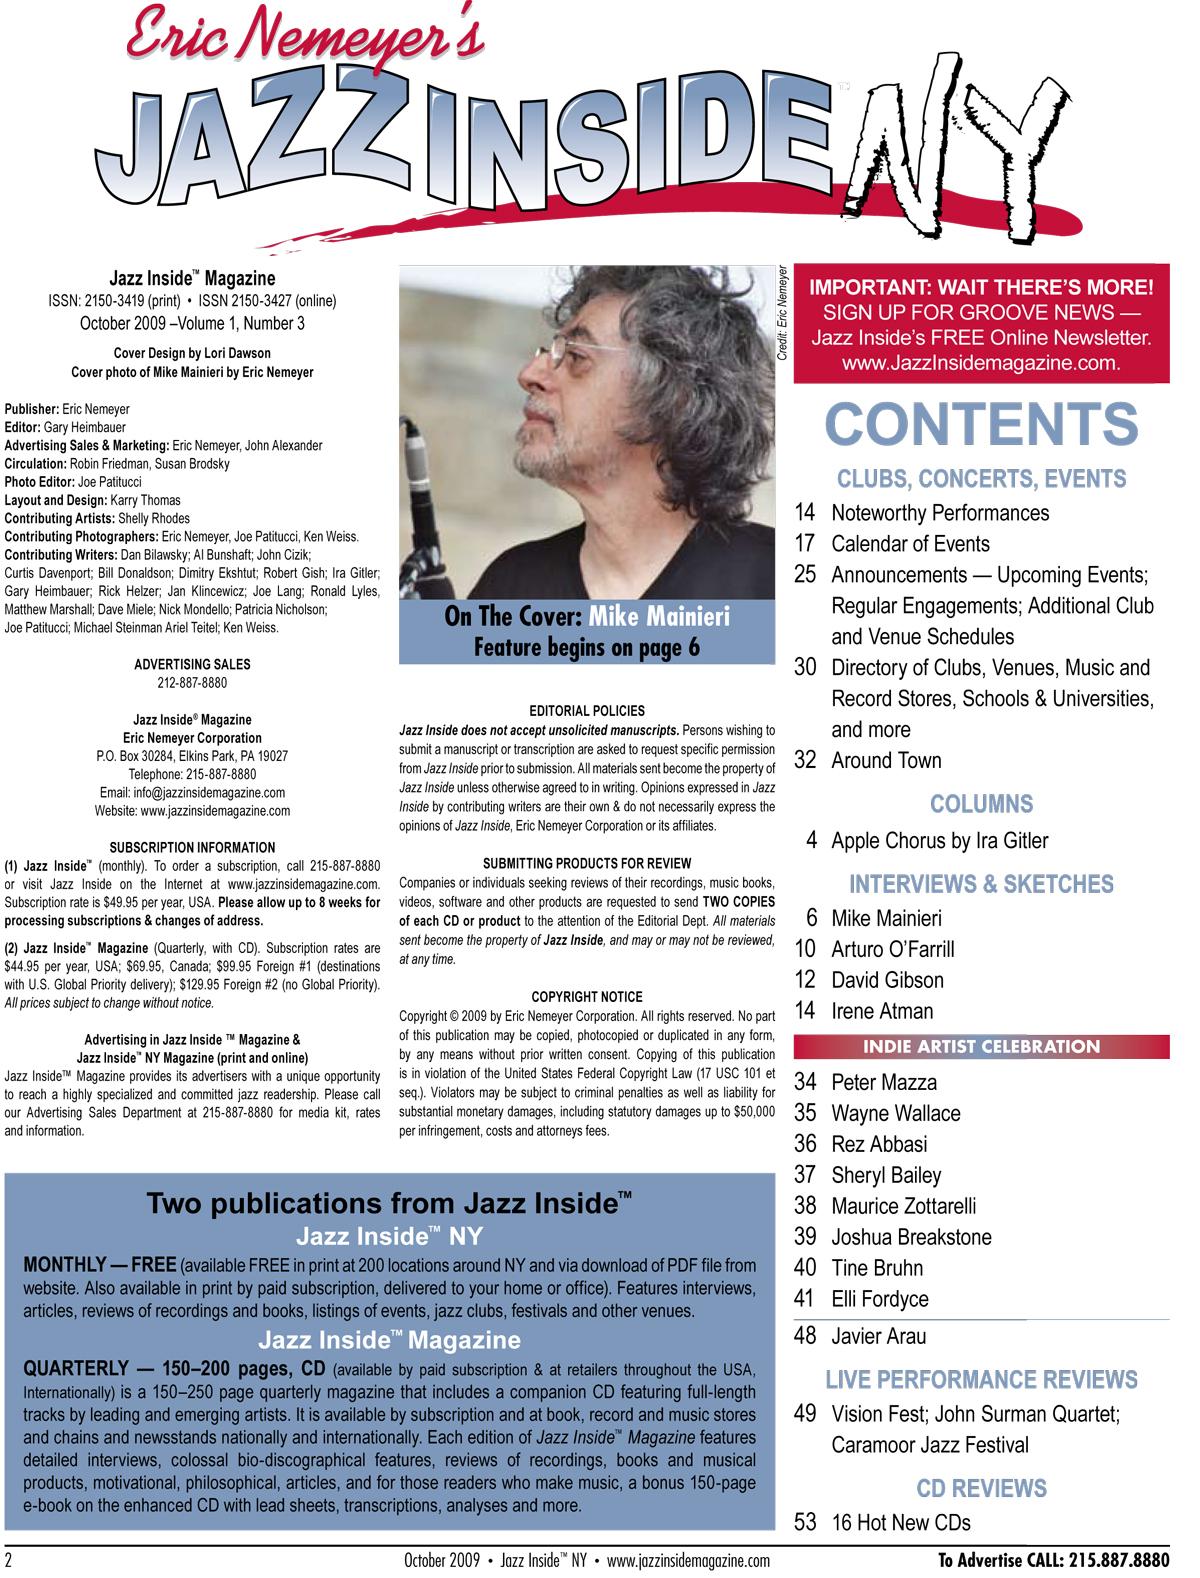 Press and Testimonial Reviews - New York Jazz Academy